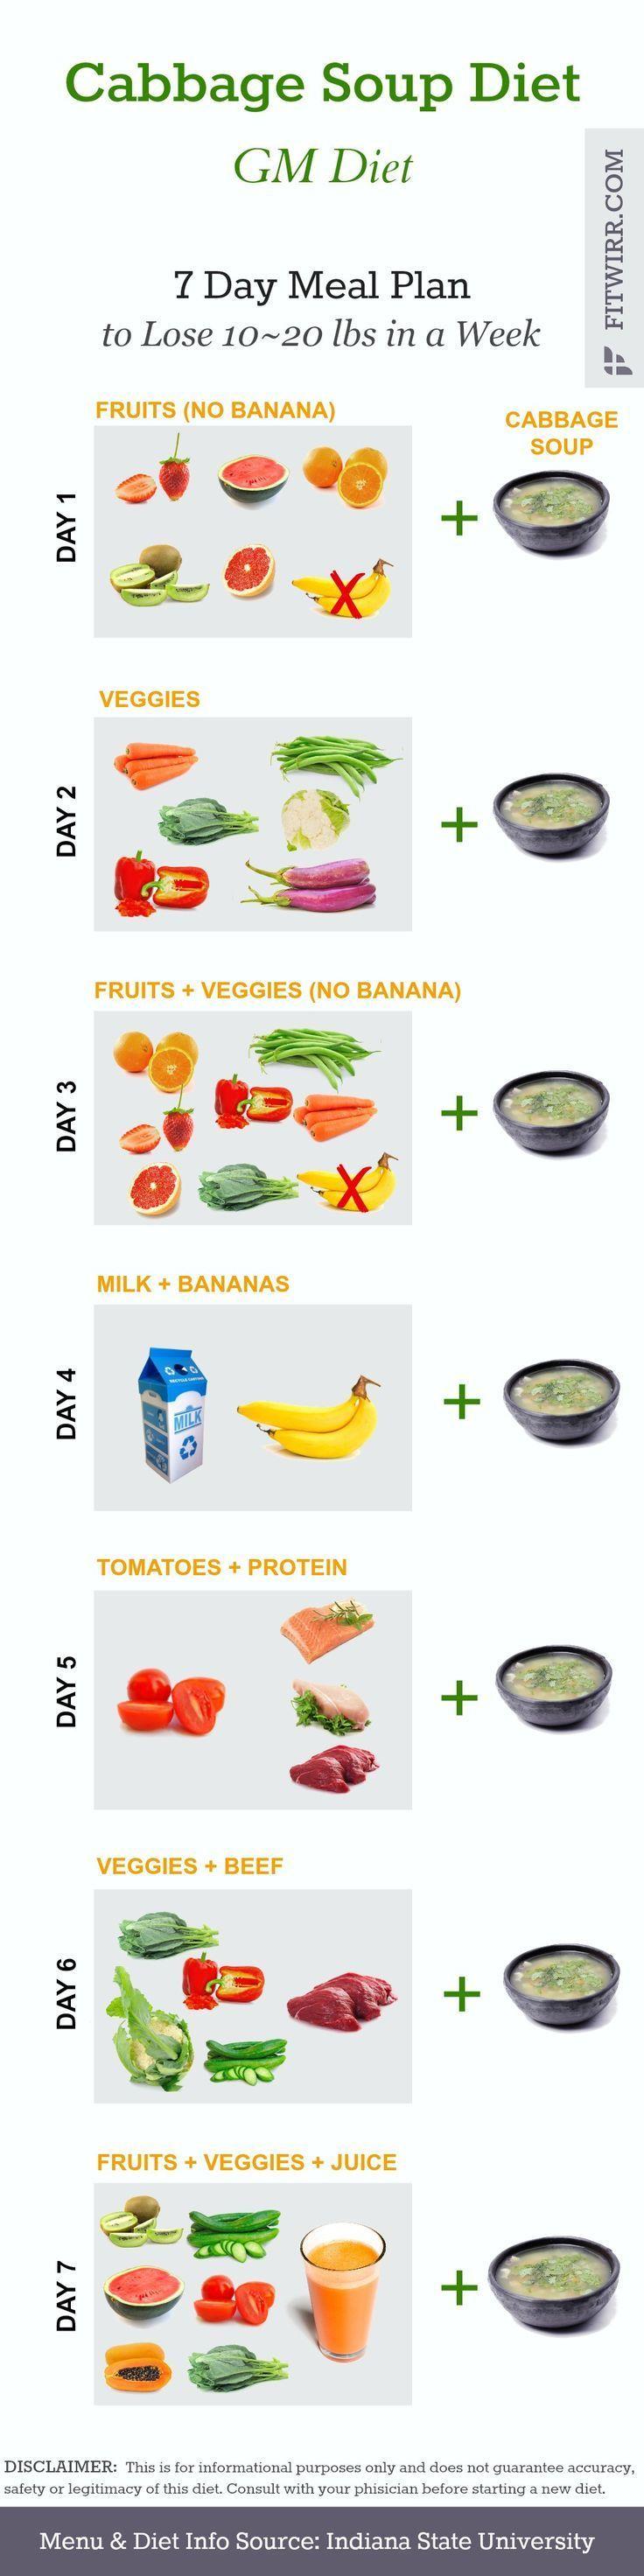 Liquid Diet Plan For Weight Loss In 7 Days Weightlosslook